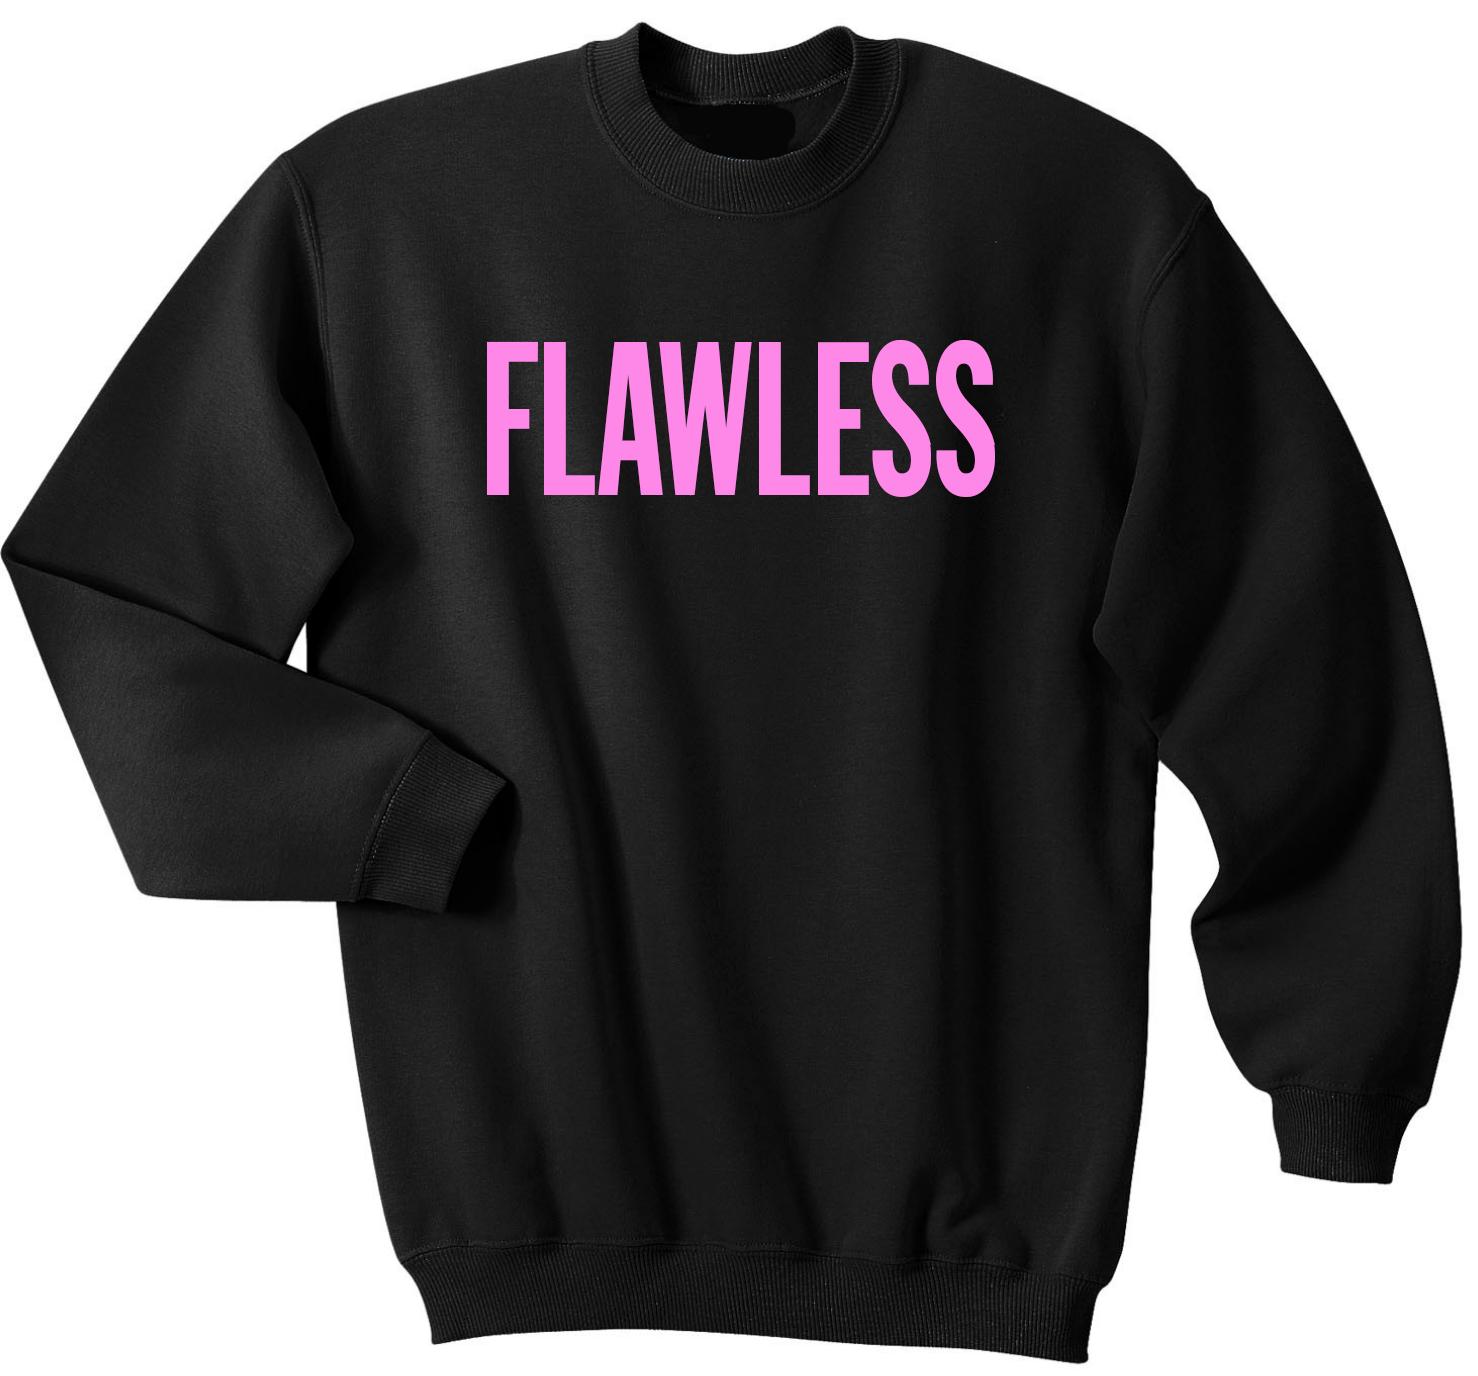 Flawless shirt